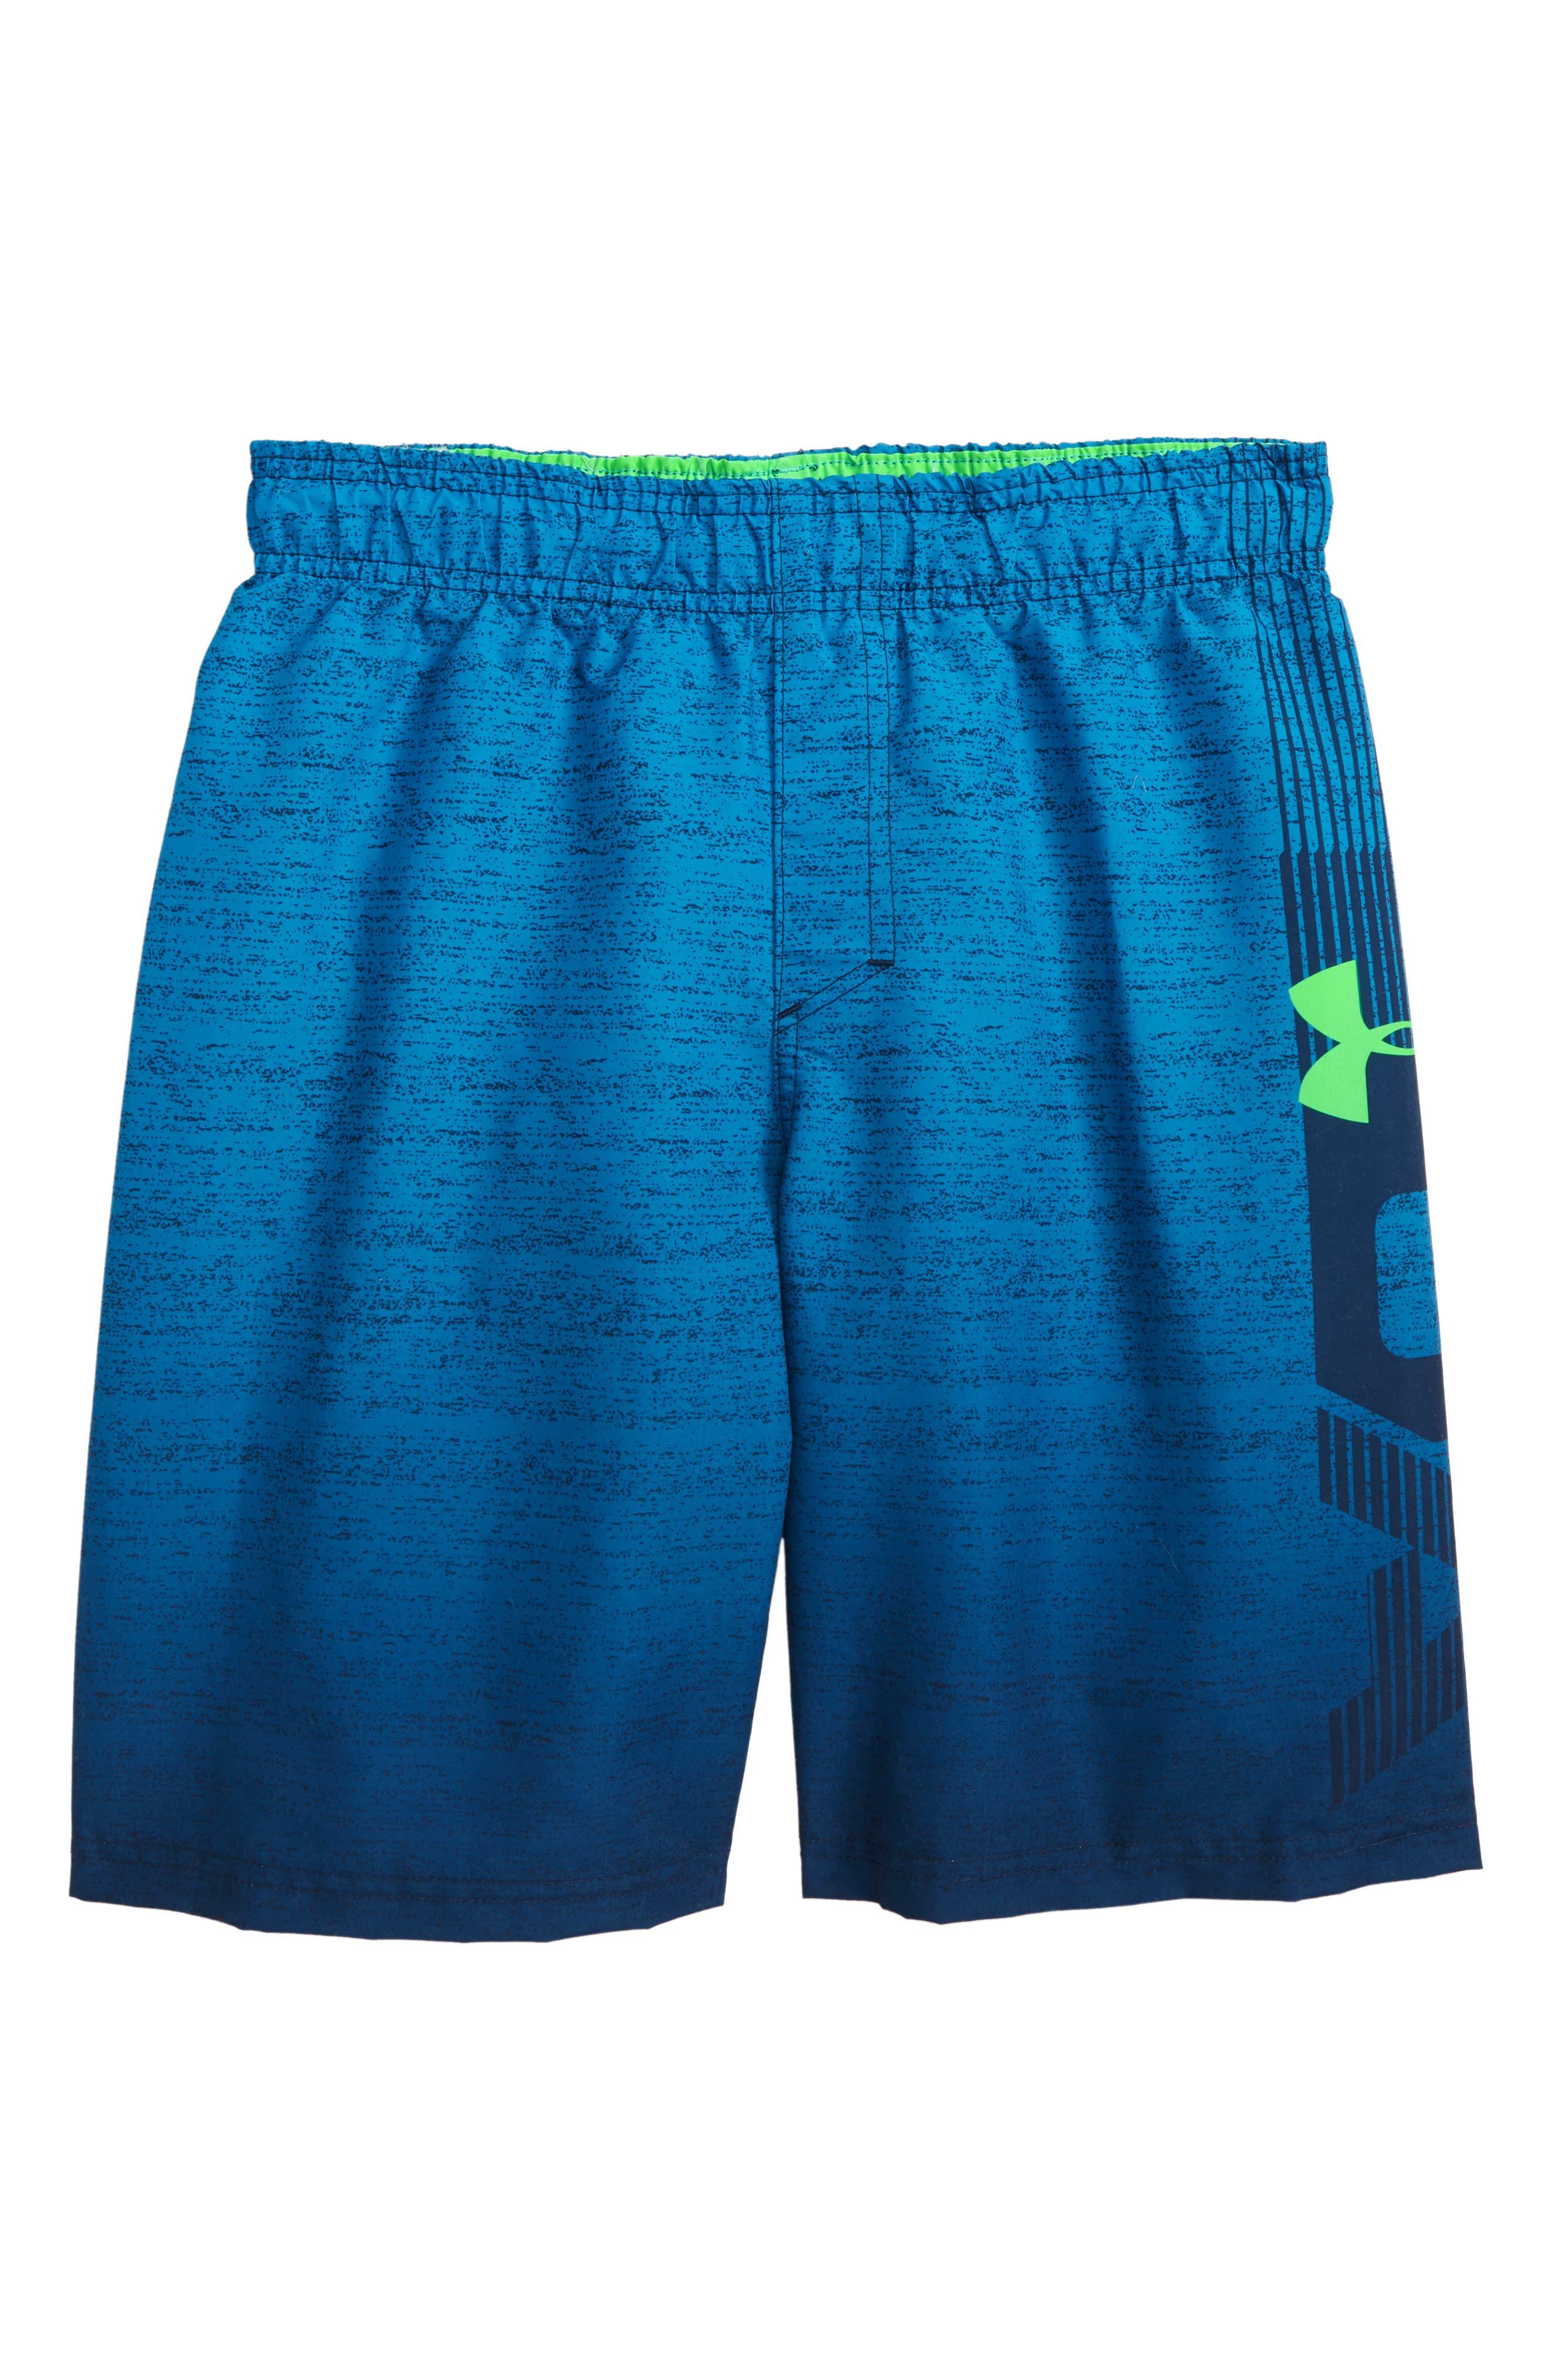 Dipper HeatGear<sup>®</sup> Volley Shorts,                             Main thumbnail 1, color,                             Academy